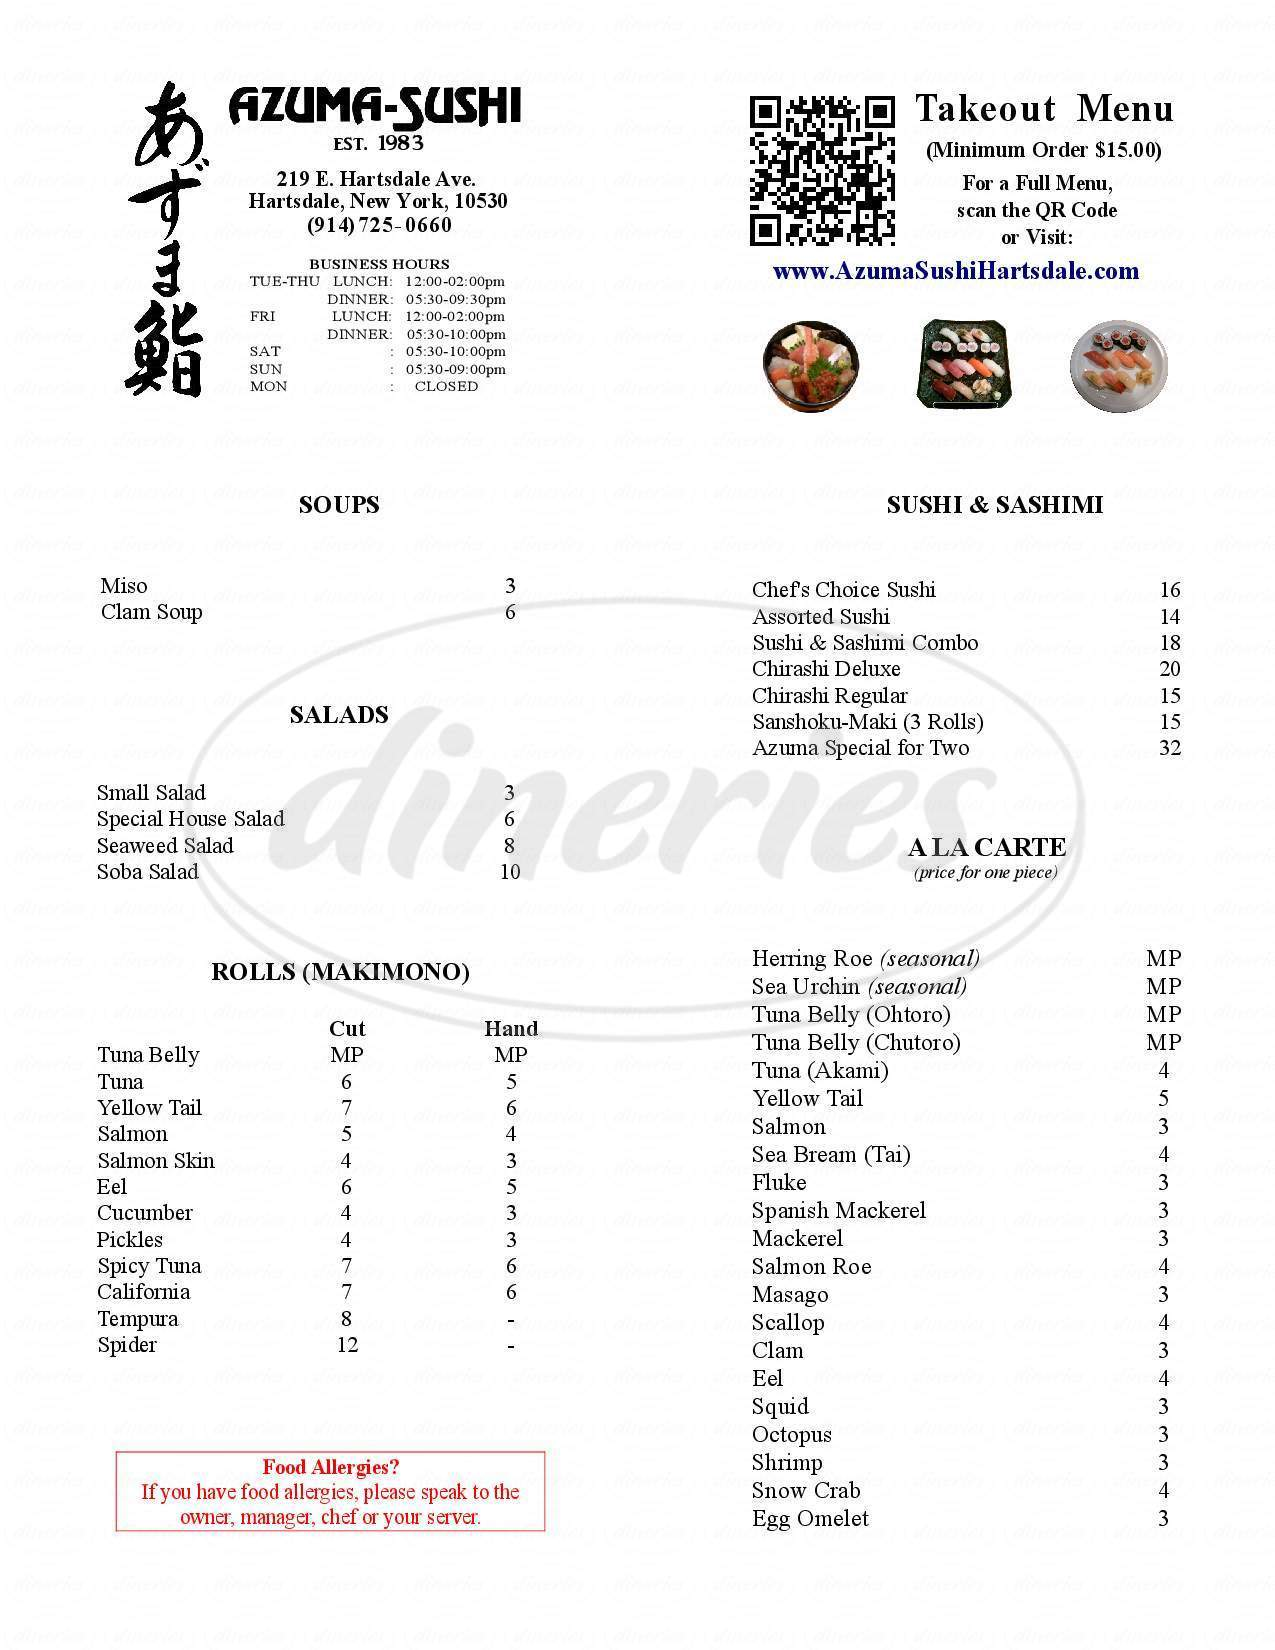 menu for Azuma Sushi